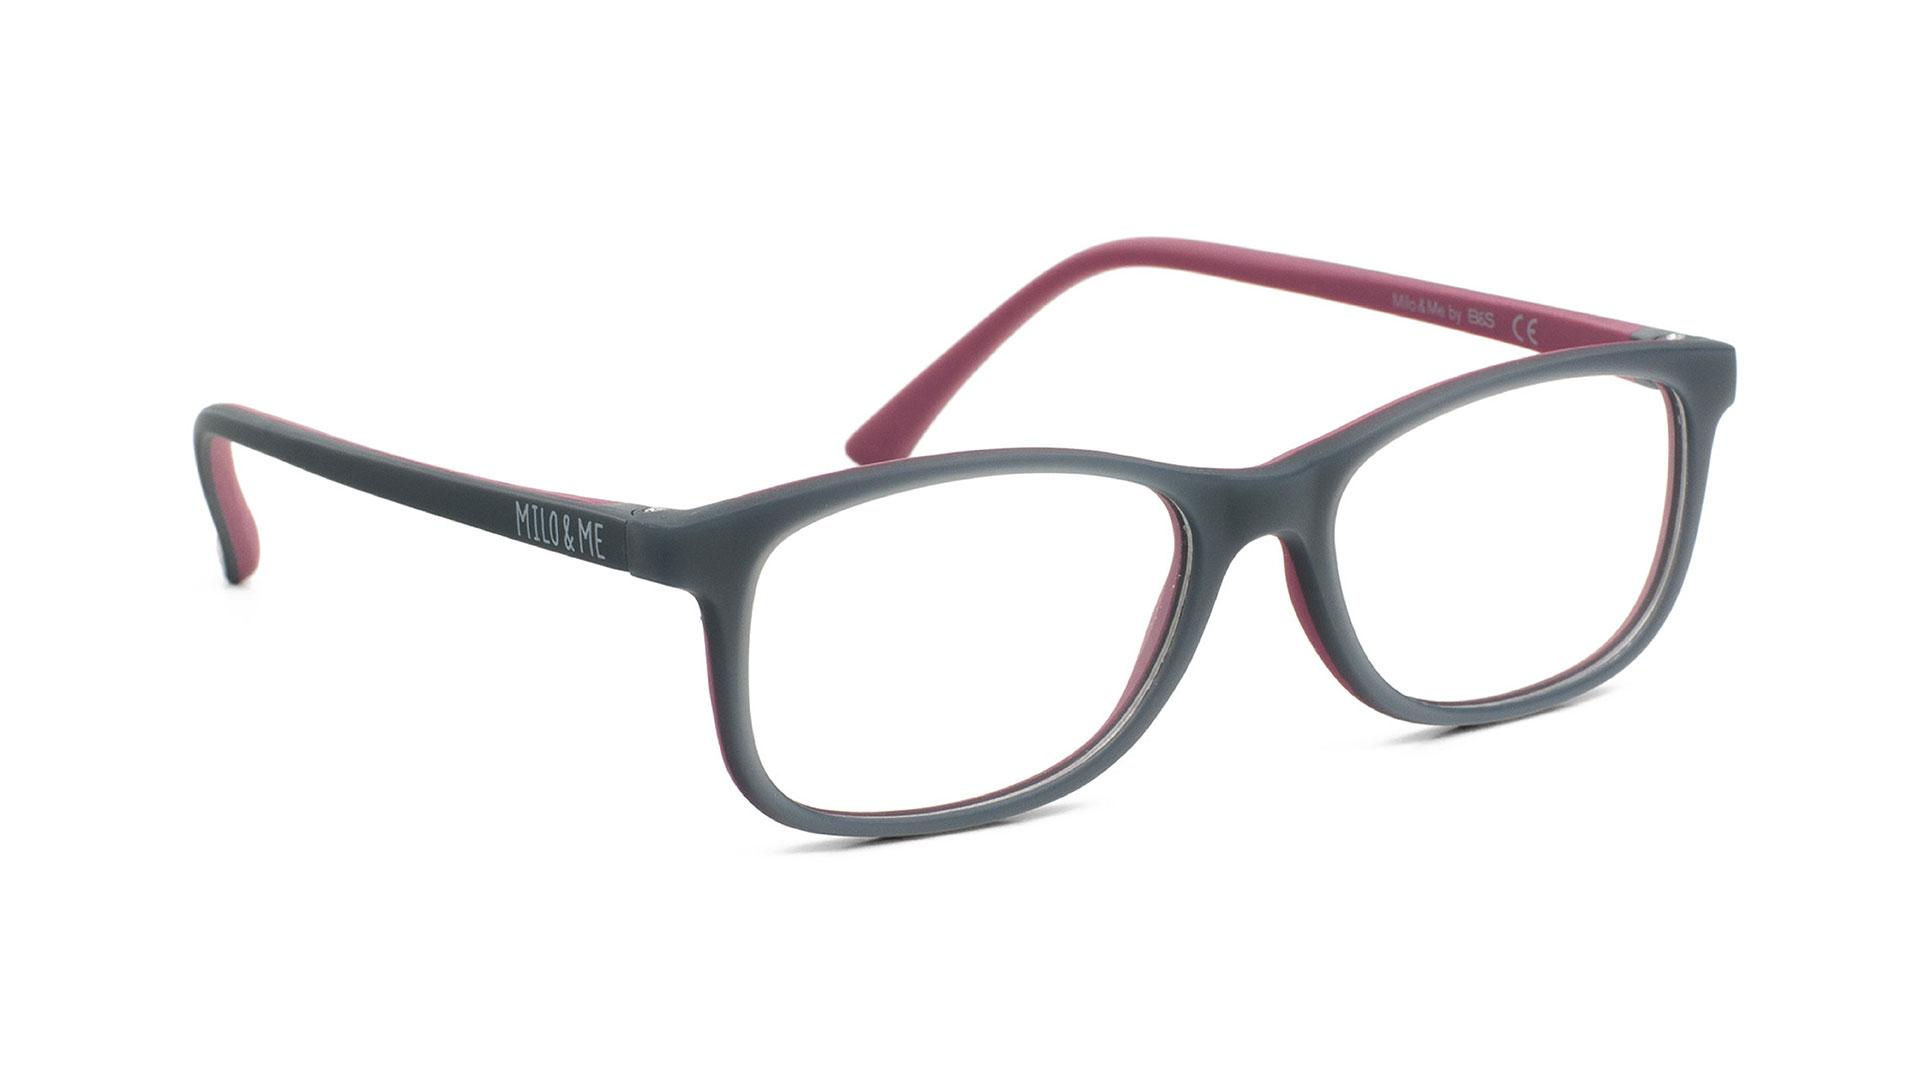 Grey Blackberry H85041-22 - Milo & Me Eyewear - Optimum RX Lens Specialists